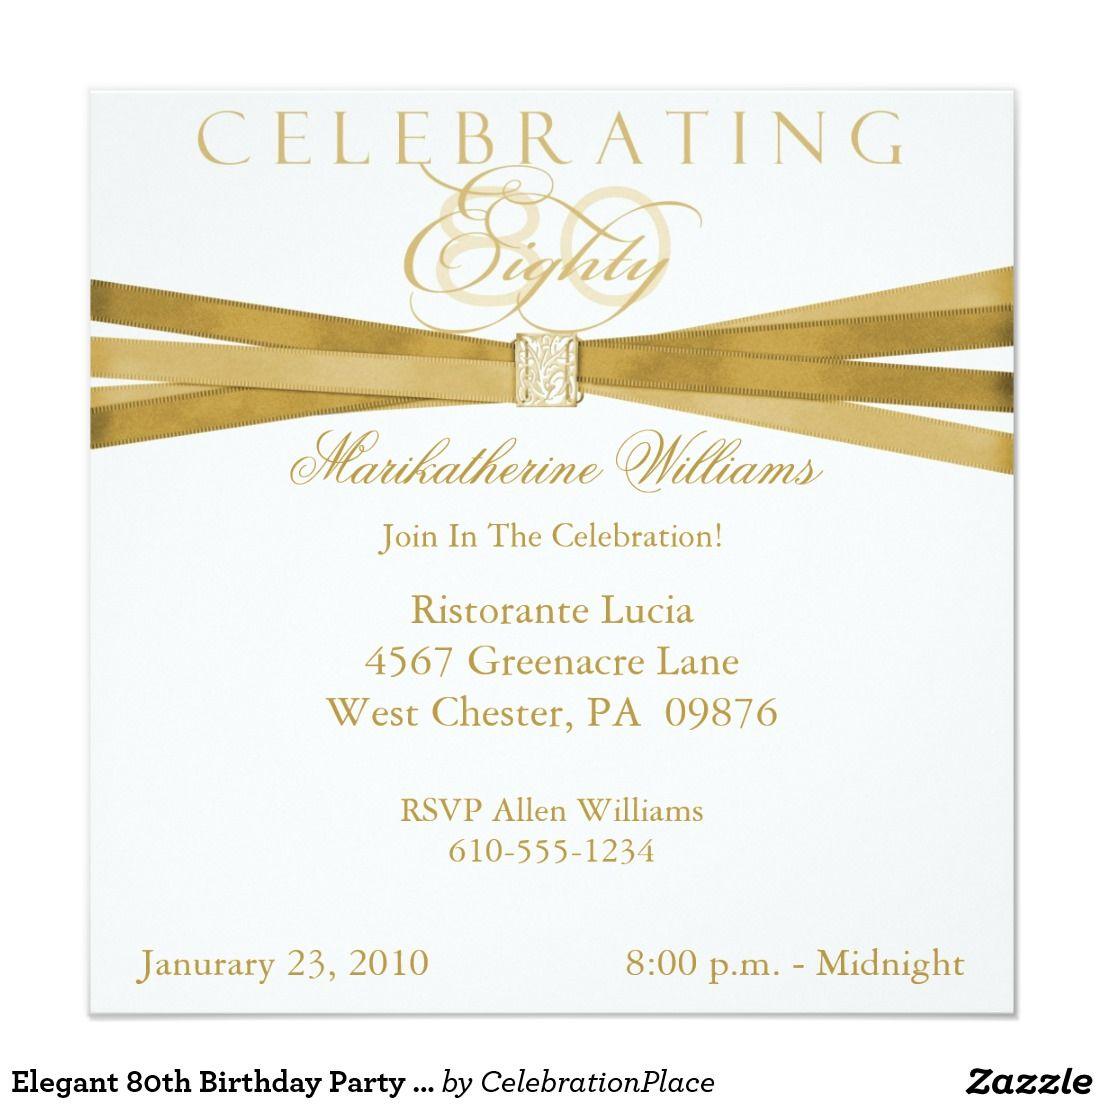 Elegant 80th Birthday Party Invitations | Highend home | Pinterest ...